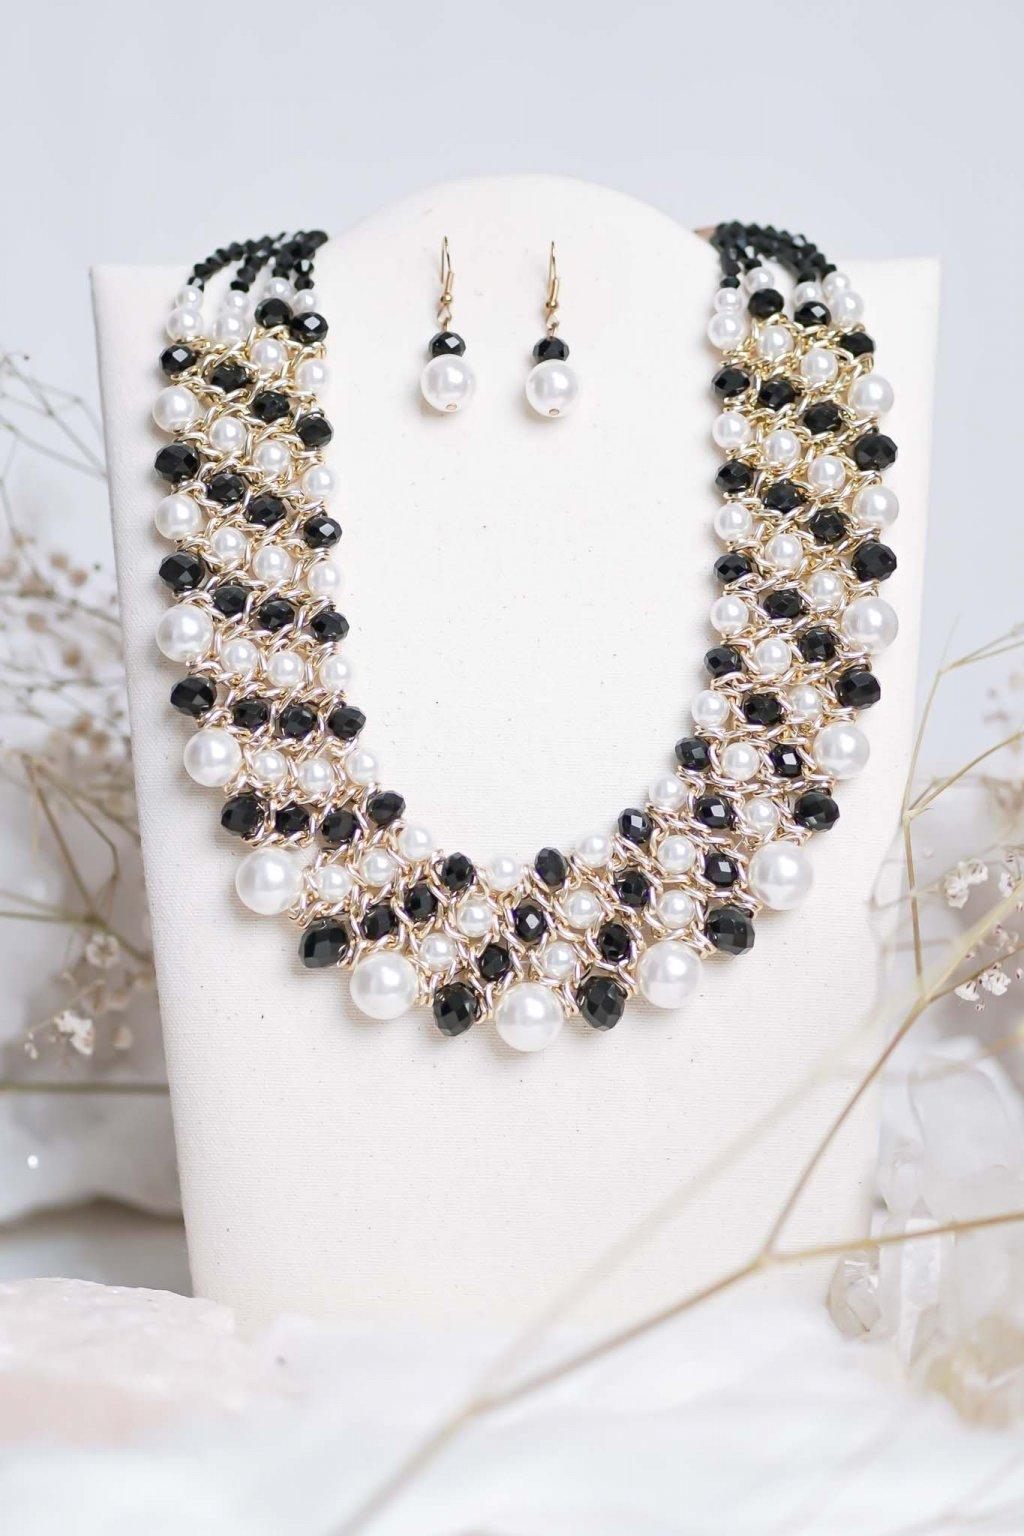 náhrdelník, šperk, spoločenská náhrdelník, náhrdelník na bežný deň, výrazný náhrdelník, jemný náhrdelník, šperky, náhrdelník na ples, svadbu, stužkovú 20